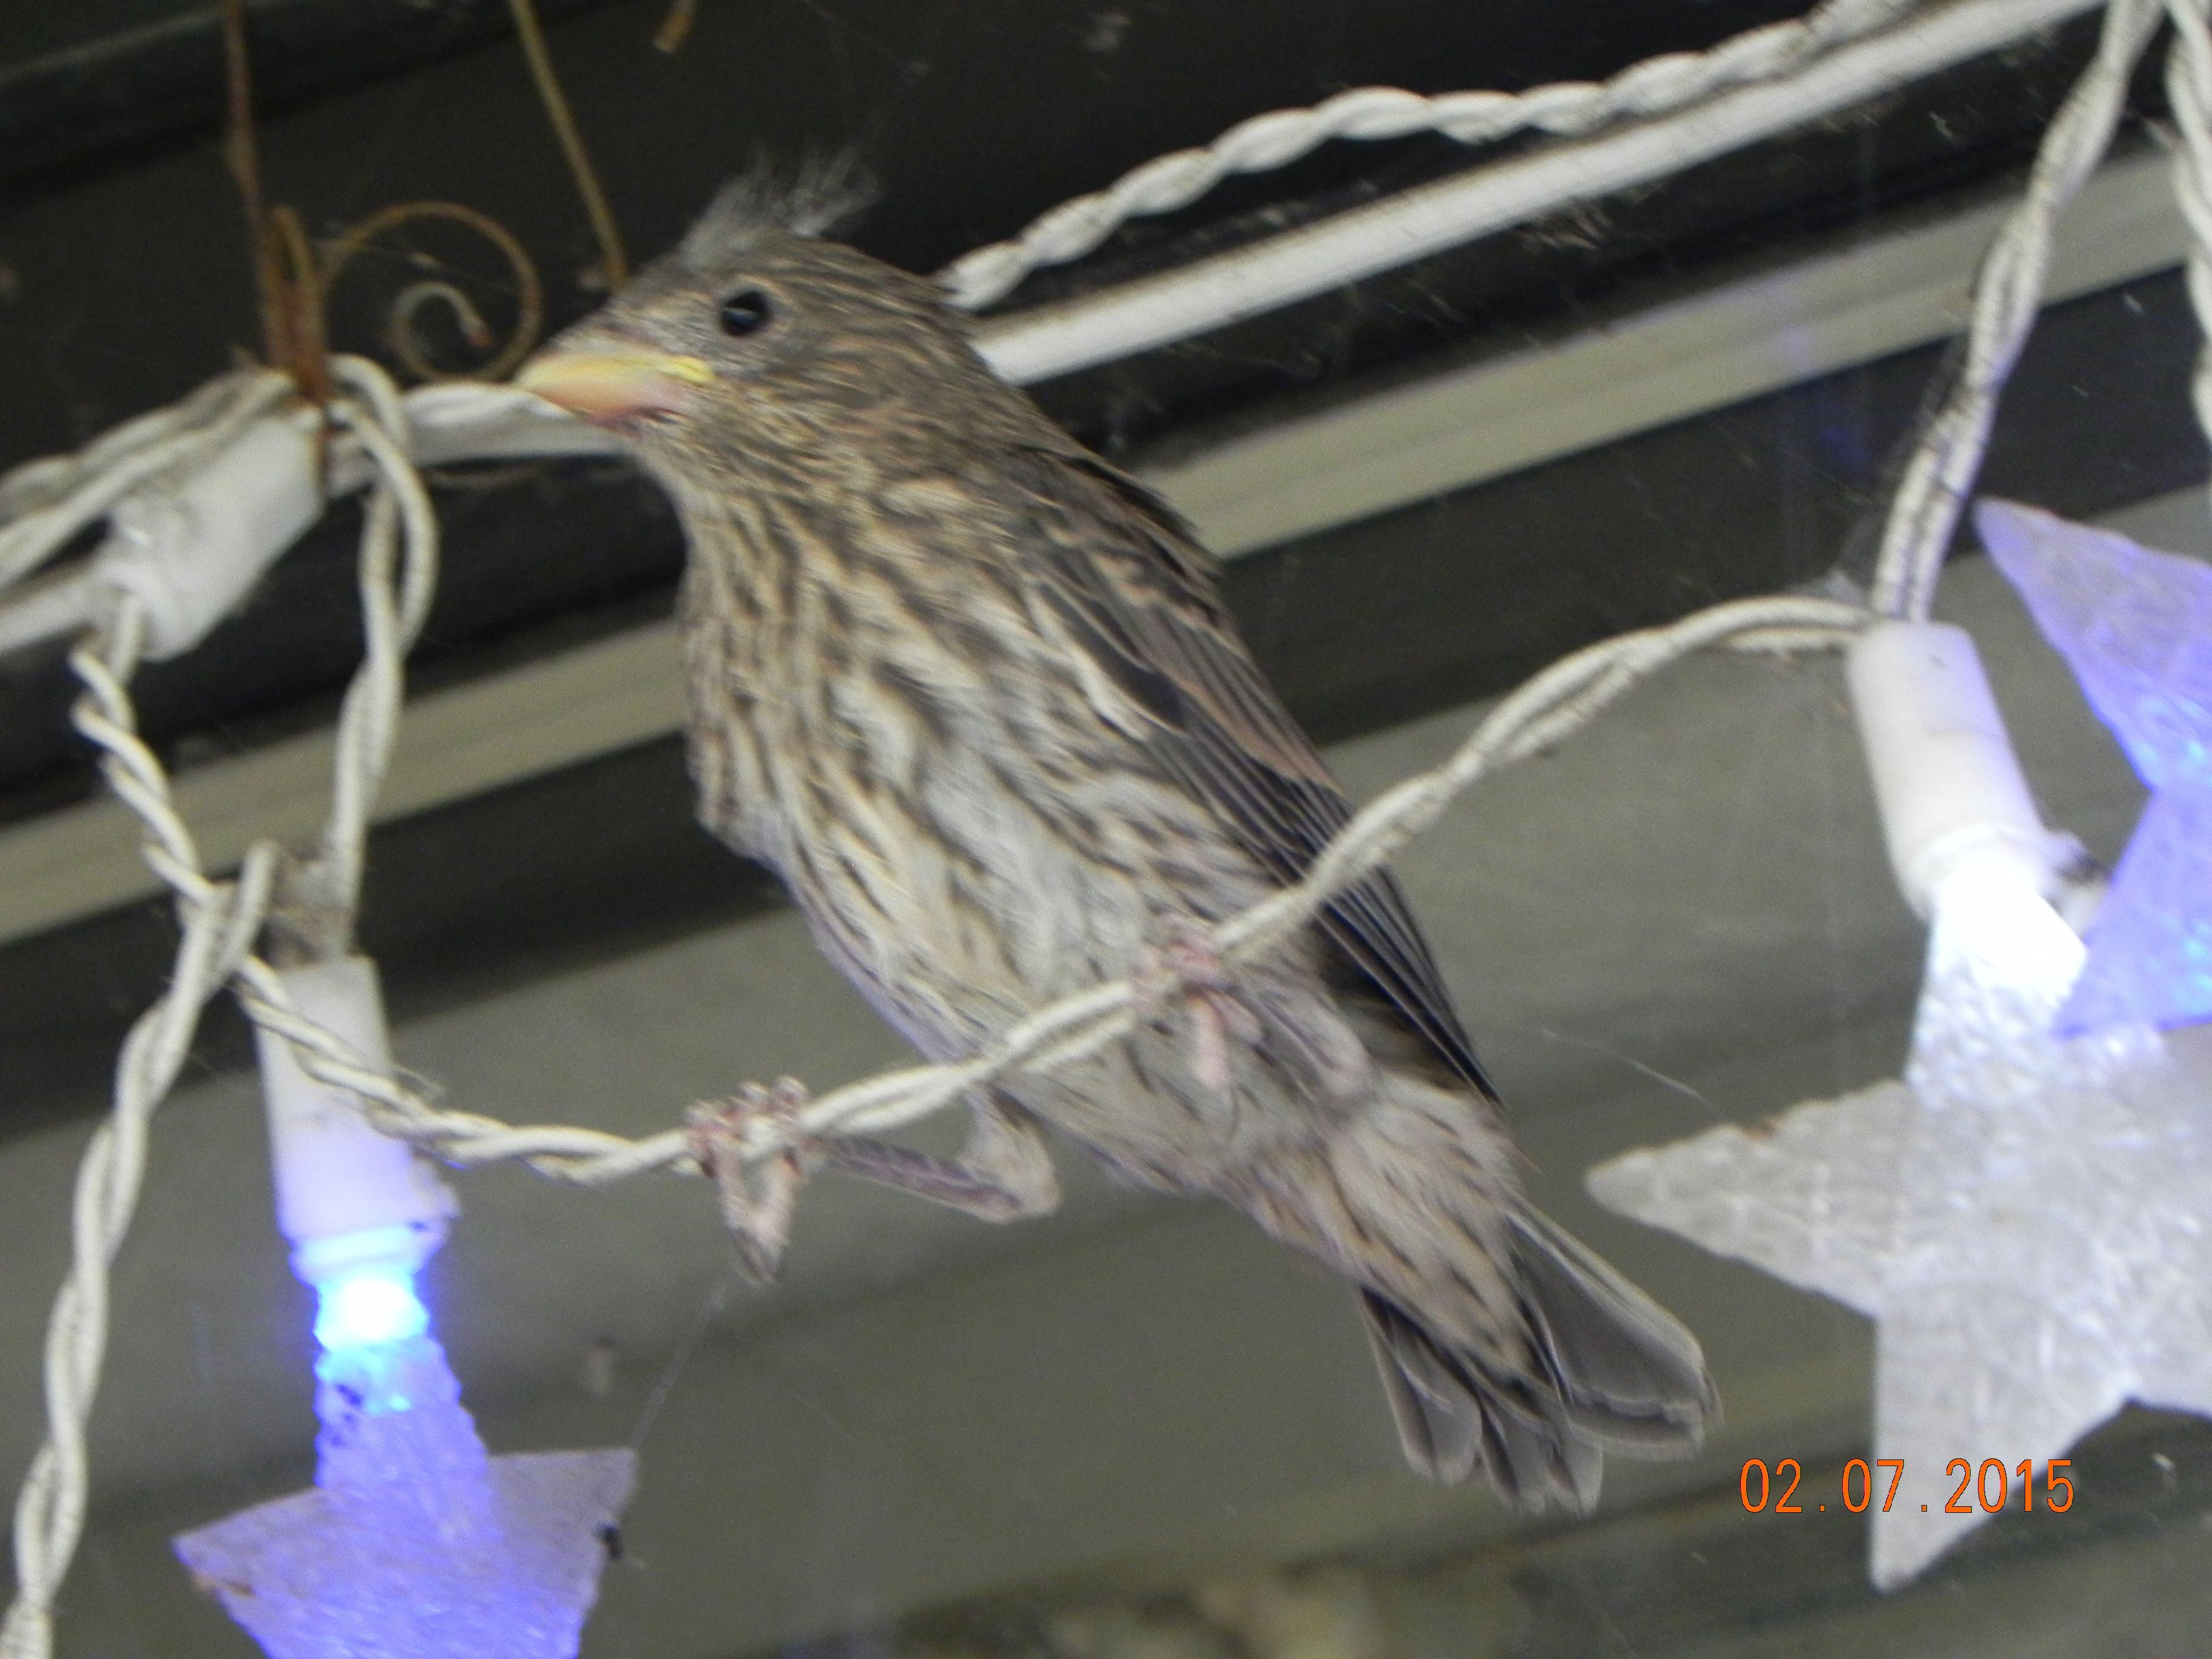 Baby bird, just ready to fly | Birds, Animals, Baby bird